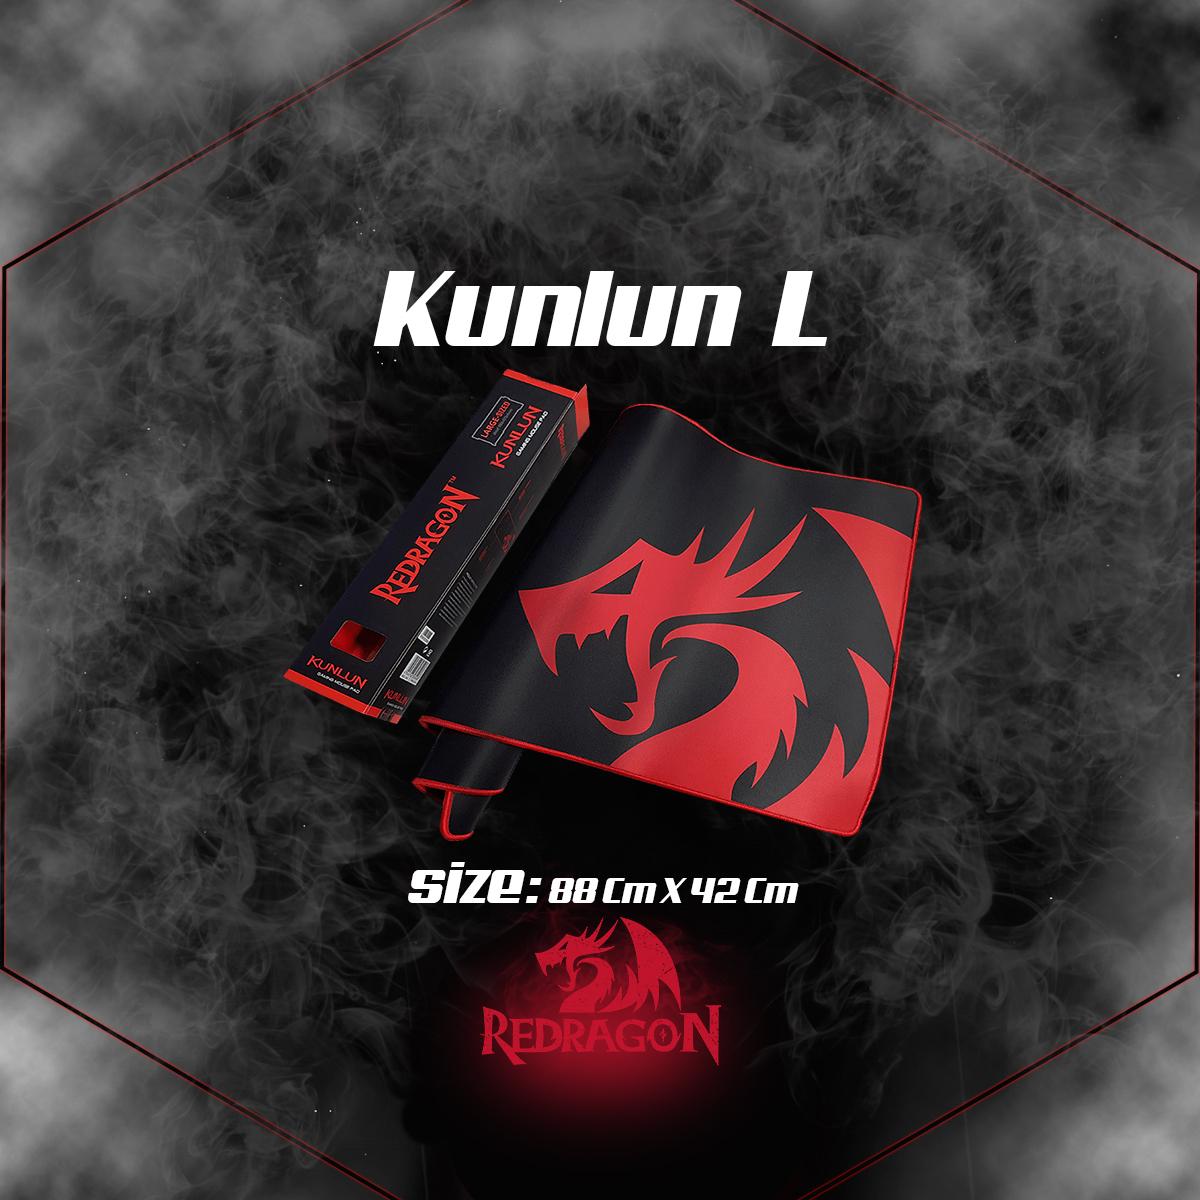 Mousepad KUNLUN L P006 (88 x 42 cm)